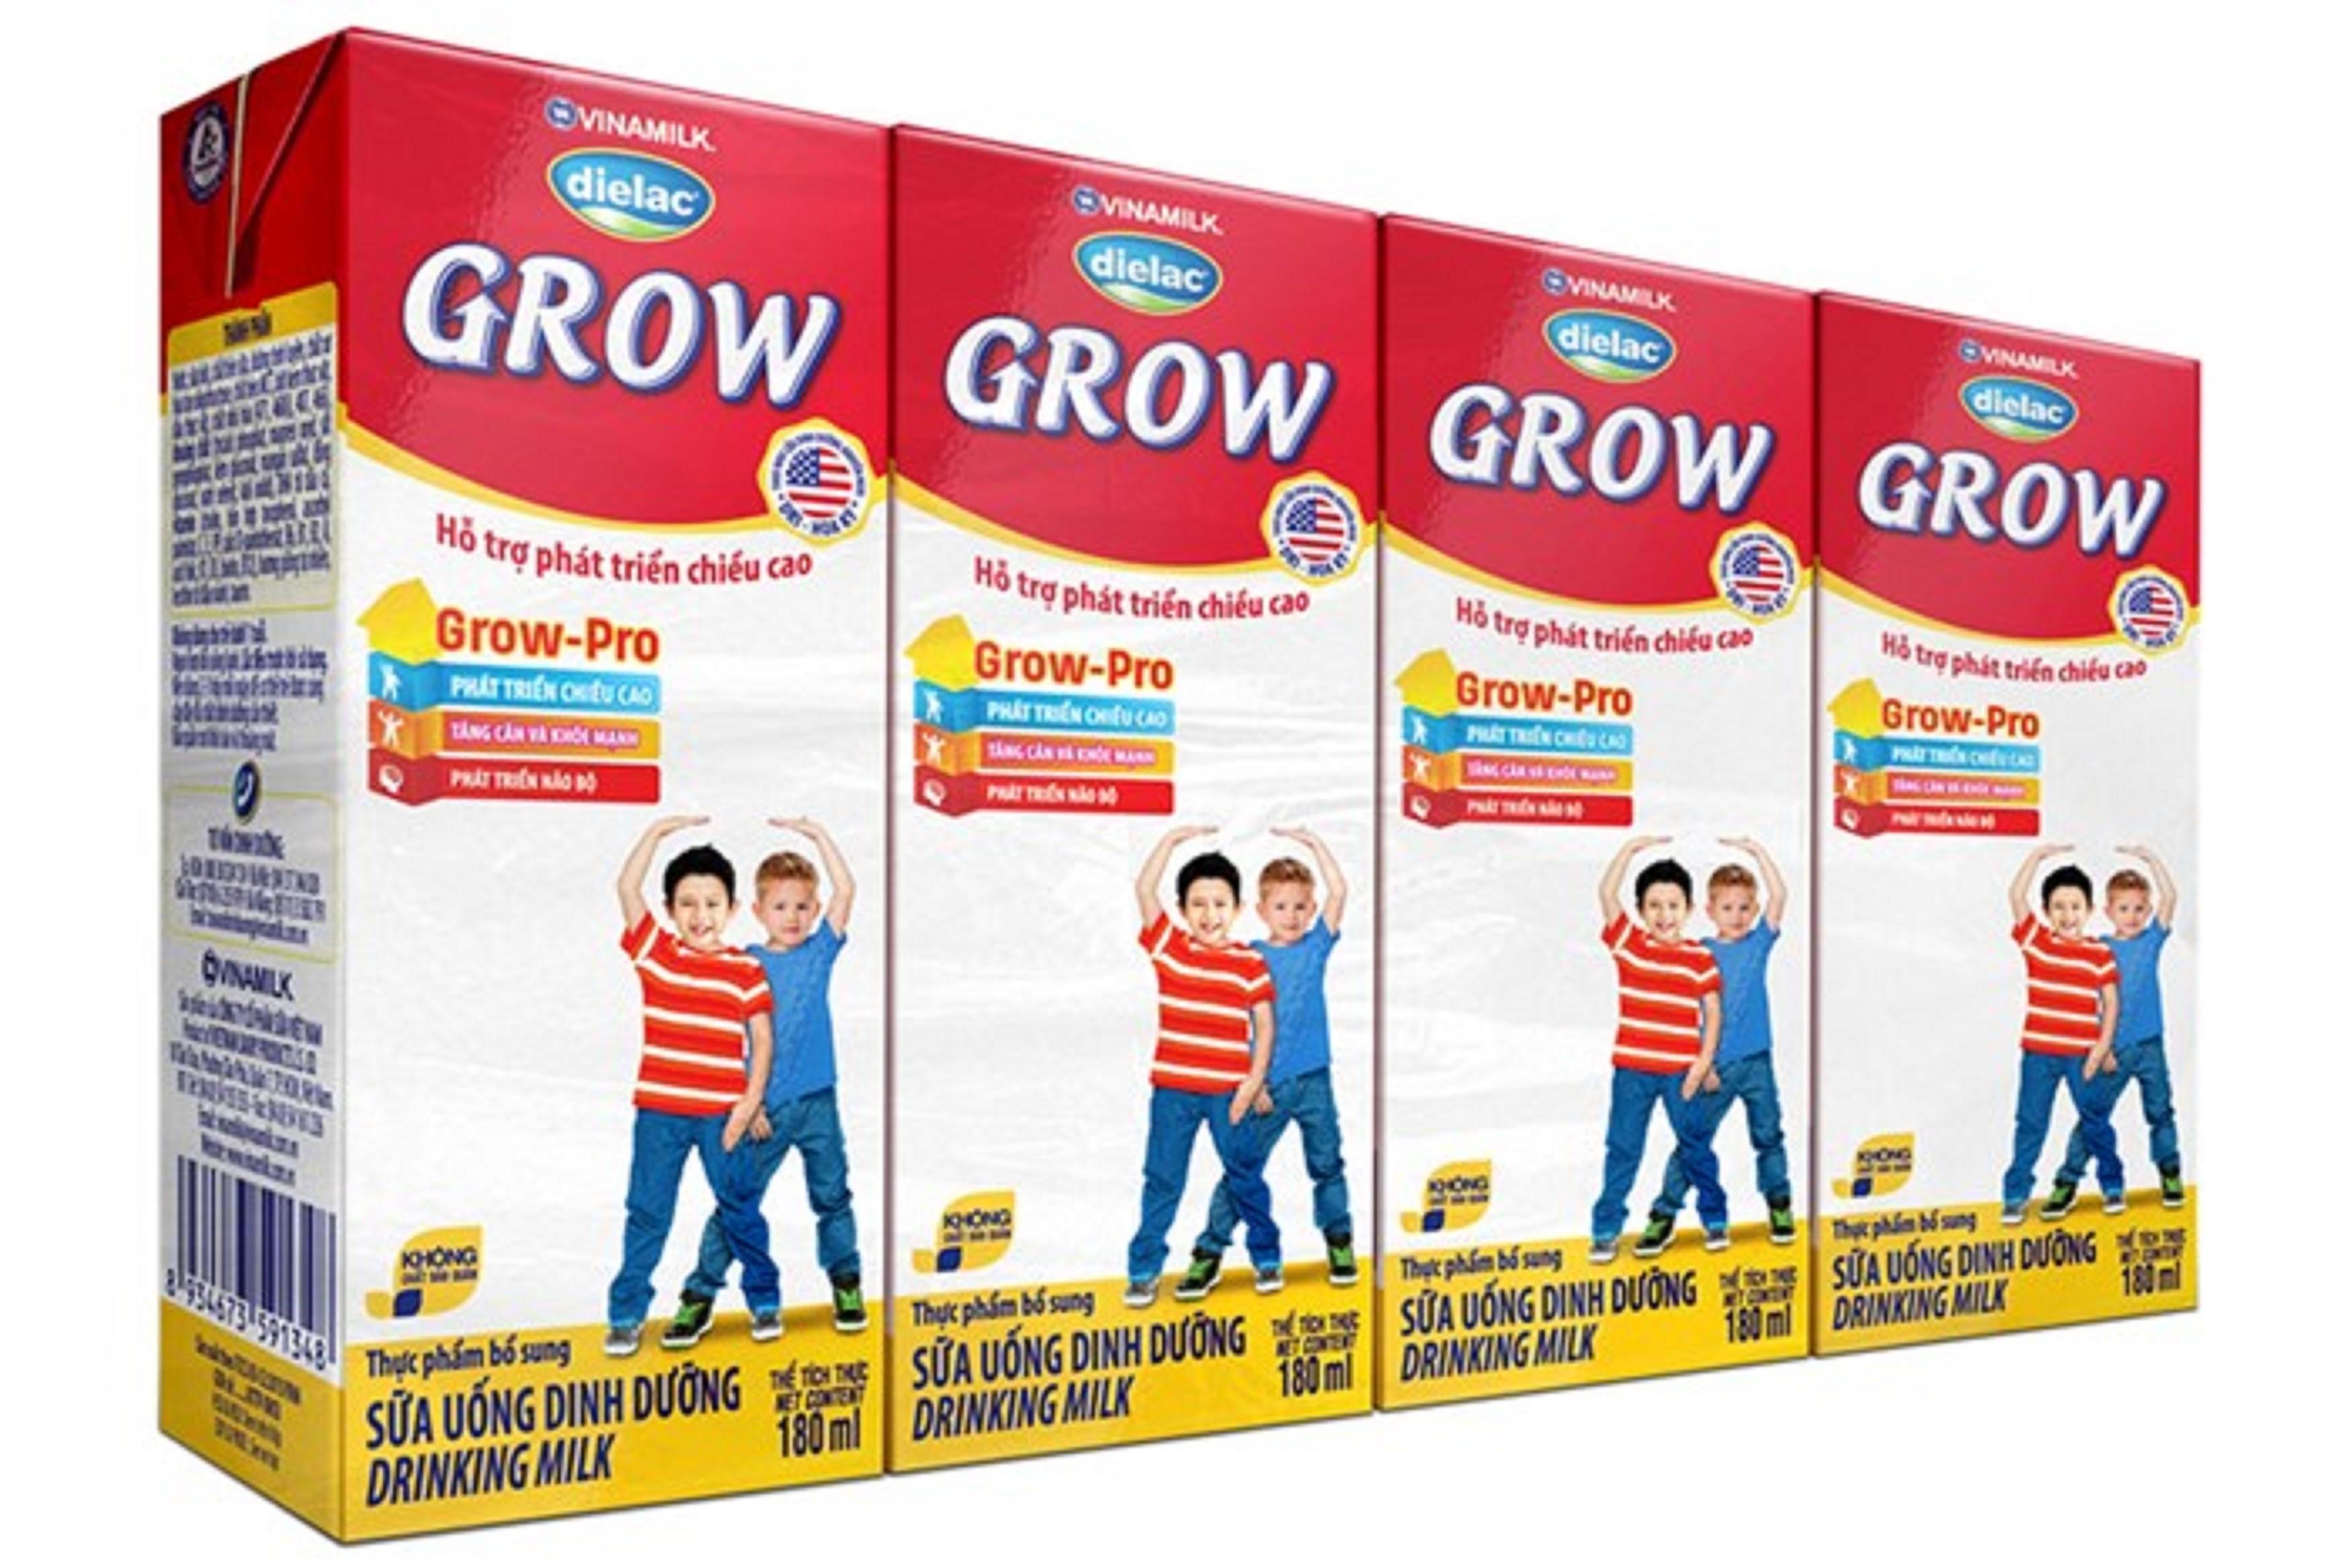 Combo 24 hộp sữa uống dinh dưỡng Vinamilk Dielac Grow 180ml - SBPS 25